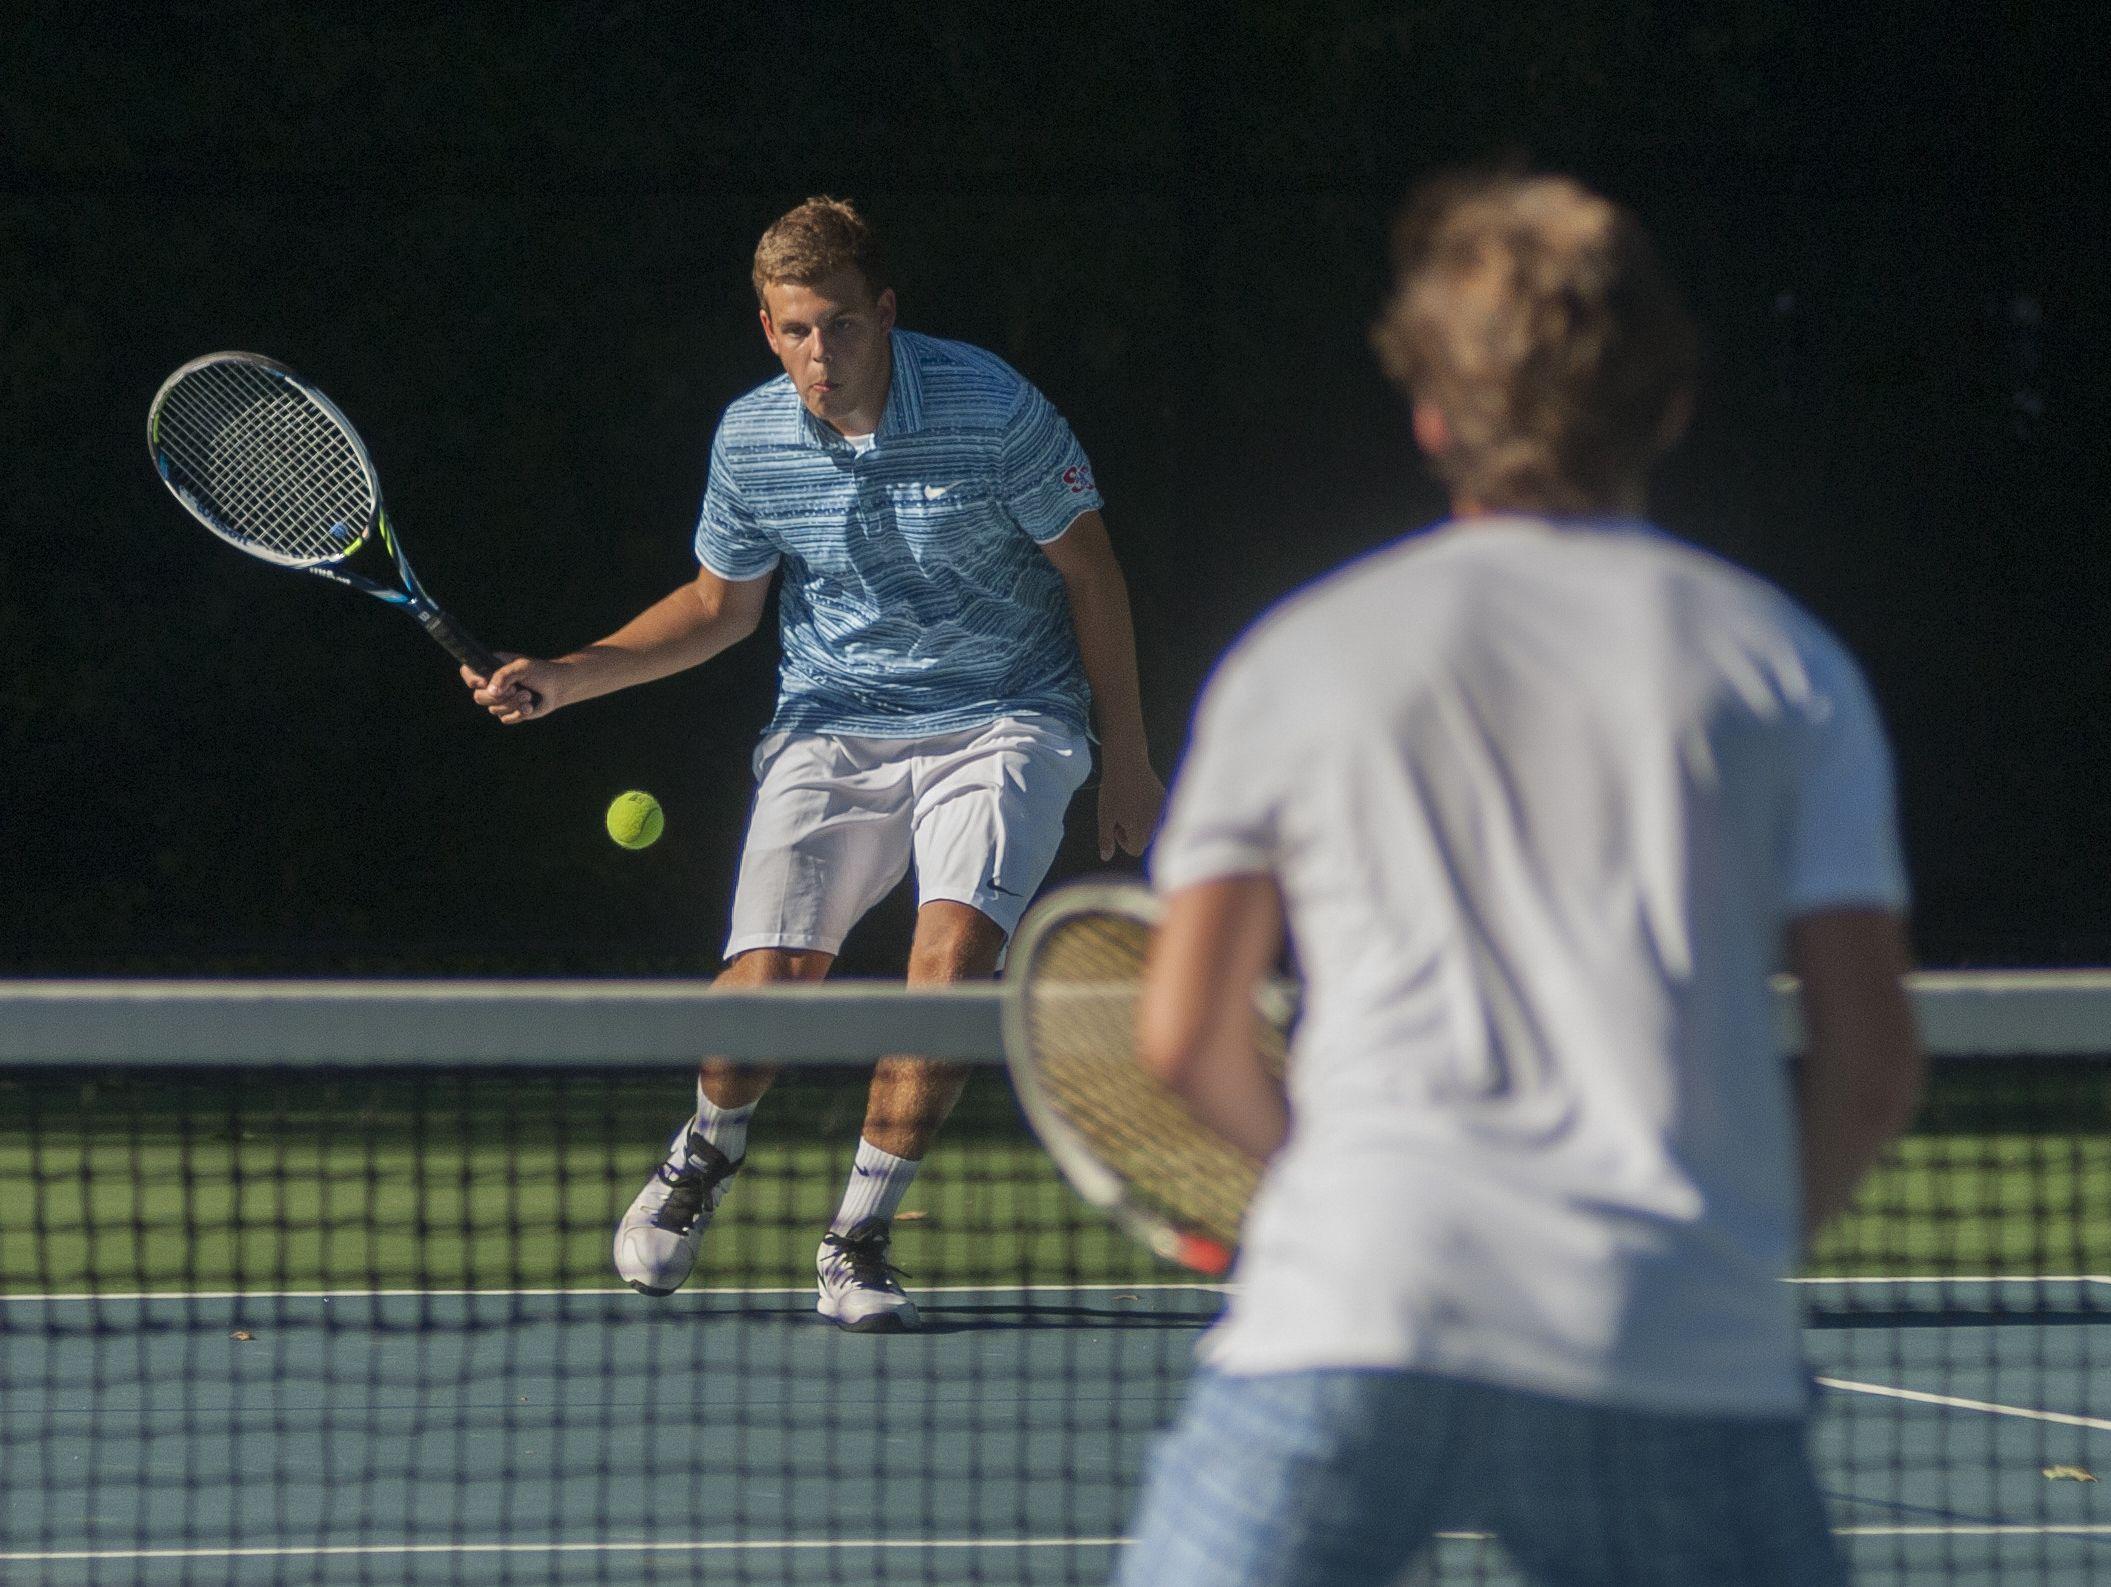 Saints' Griffin Vigneron readies to hit the ball Monday, Sept. 12, during boys tennis action at Sanborn Park tennis courts.